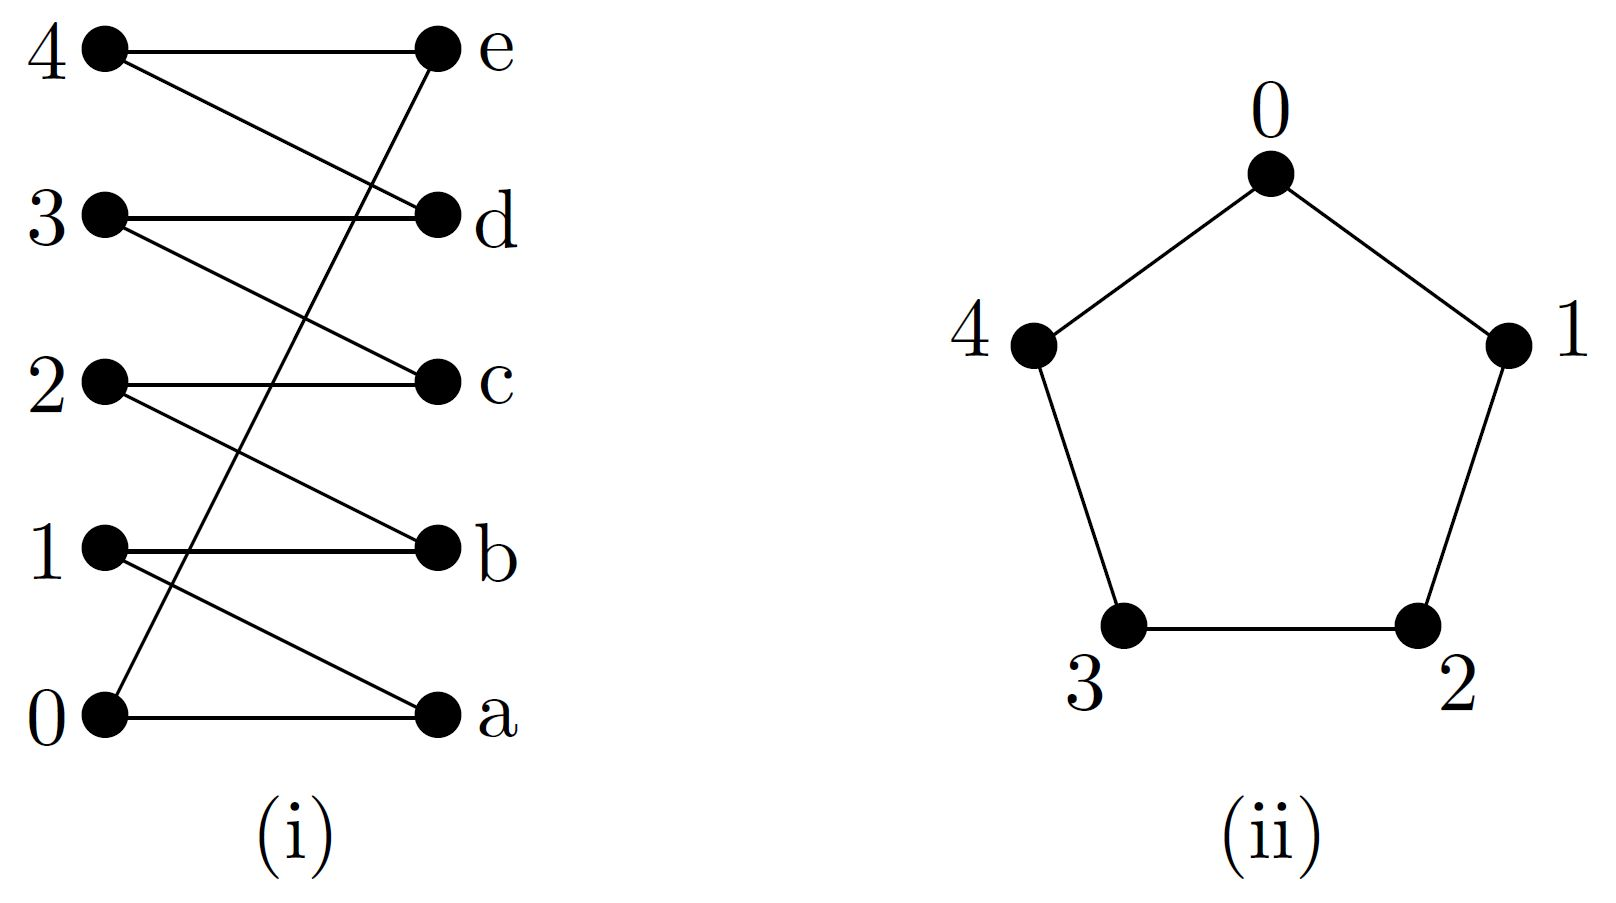 Never Mind The Noise Quantum Entanglement Allows Channel